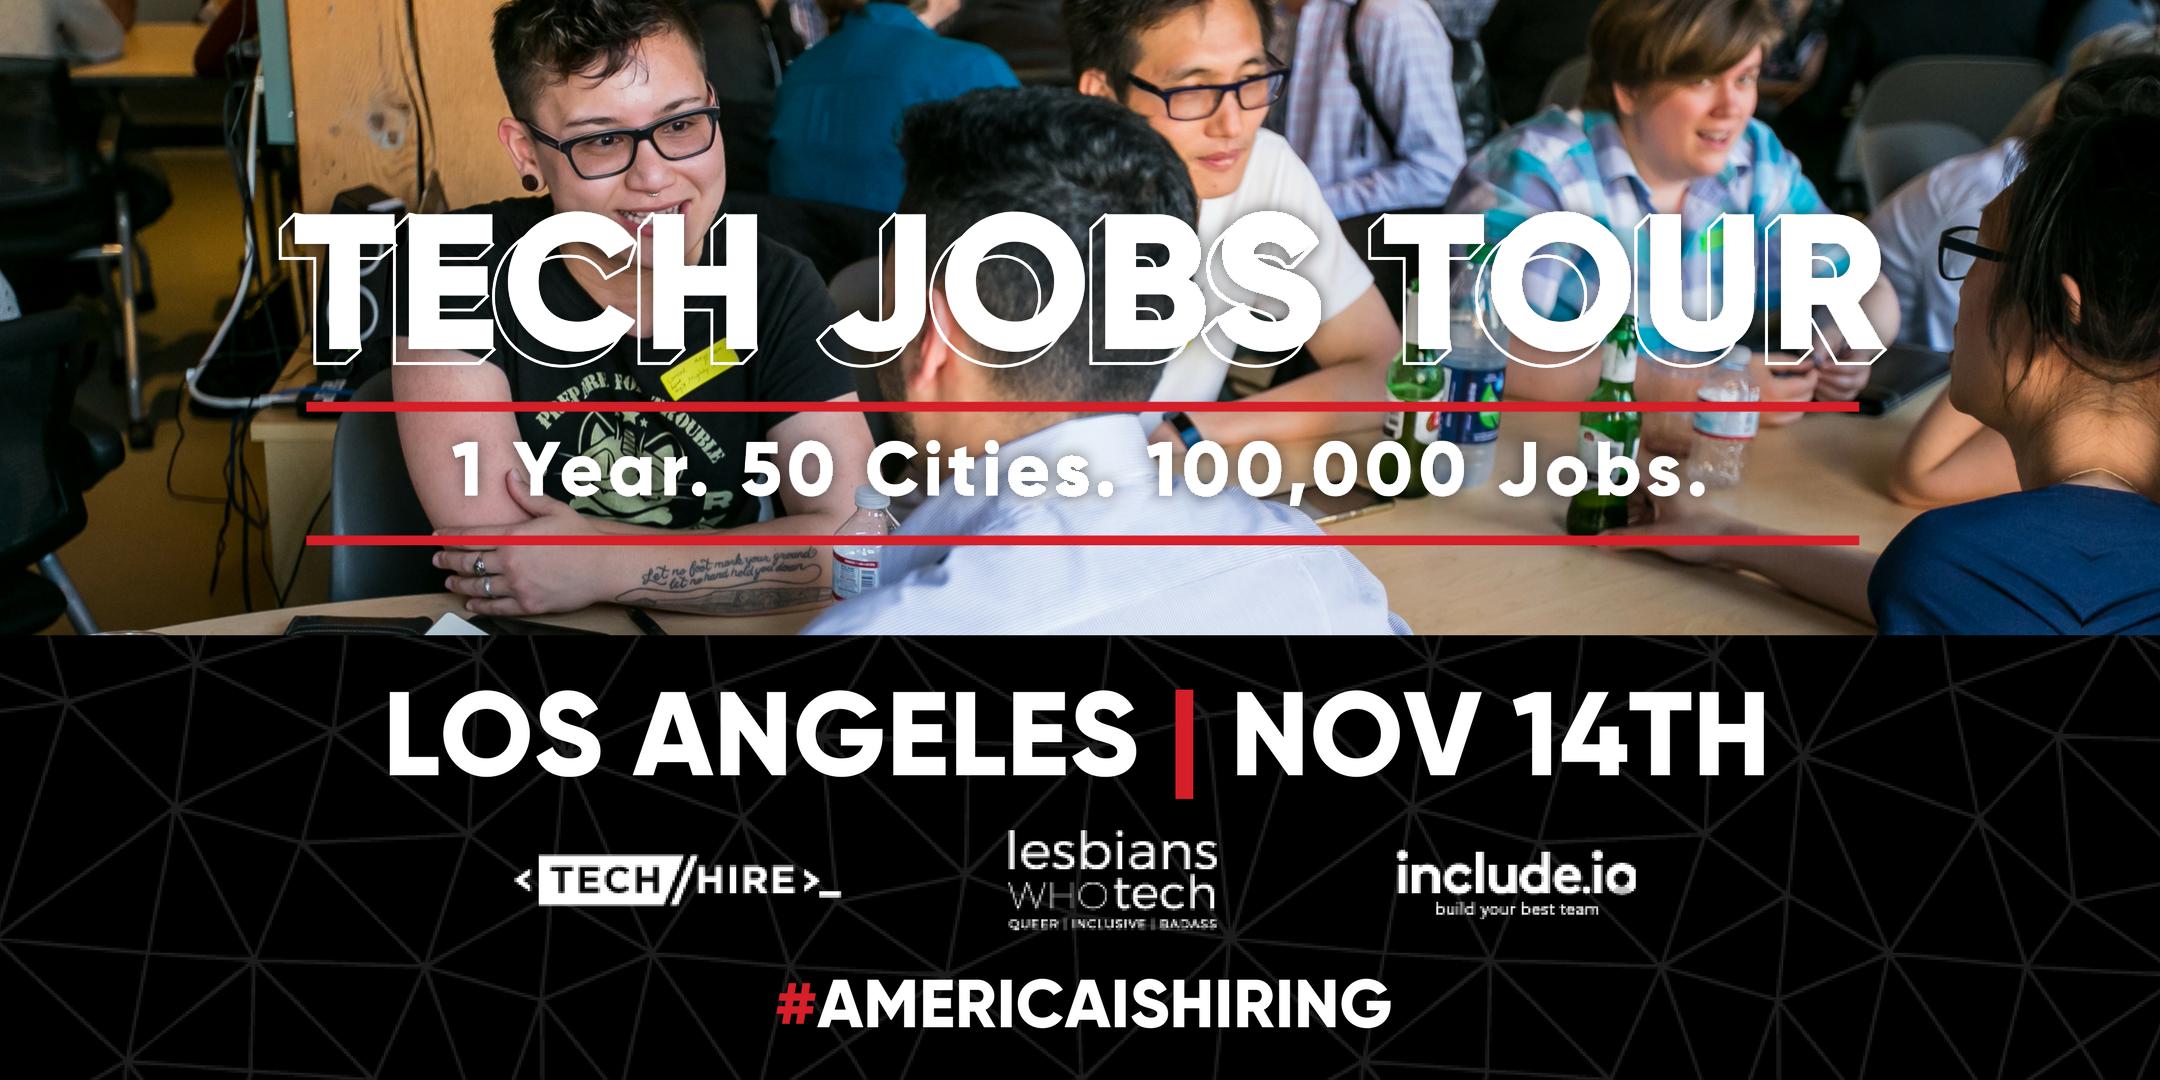 Tech Jobs Tour Los Angeles | Career Fair, Tech Demos + Speed Mentoring